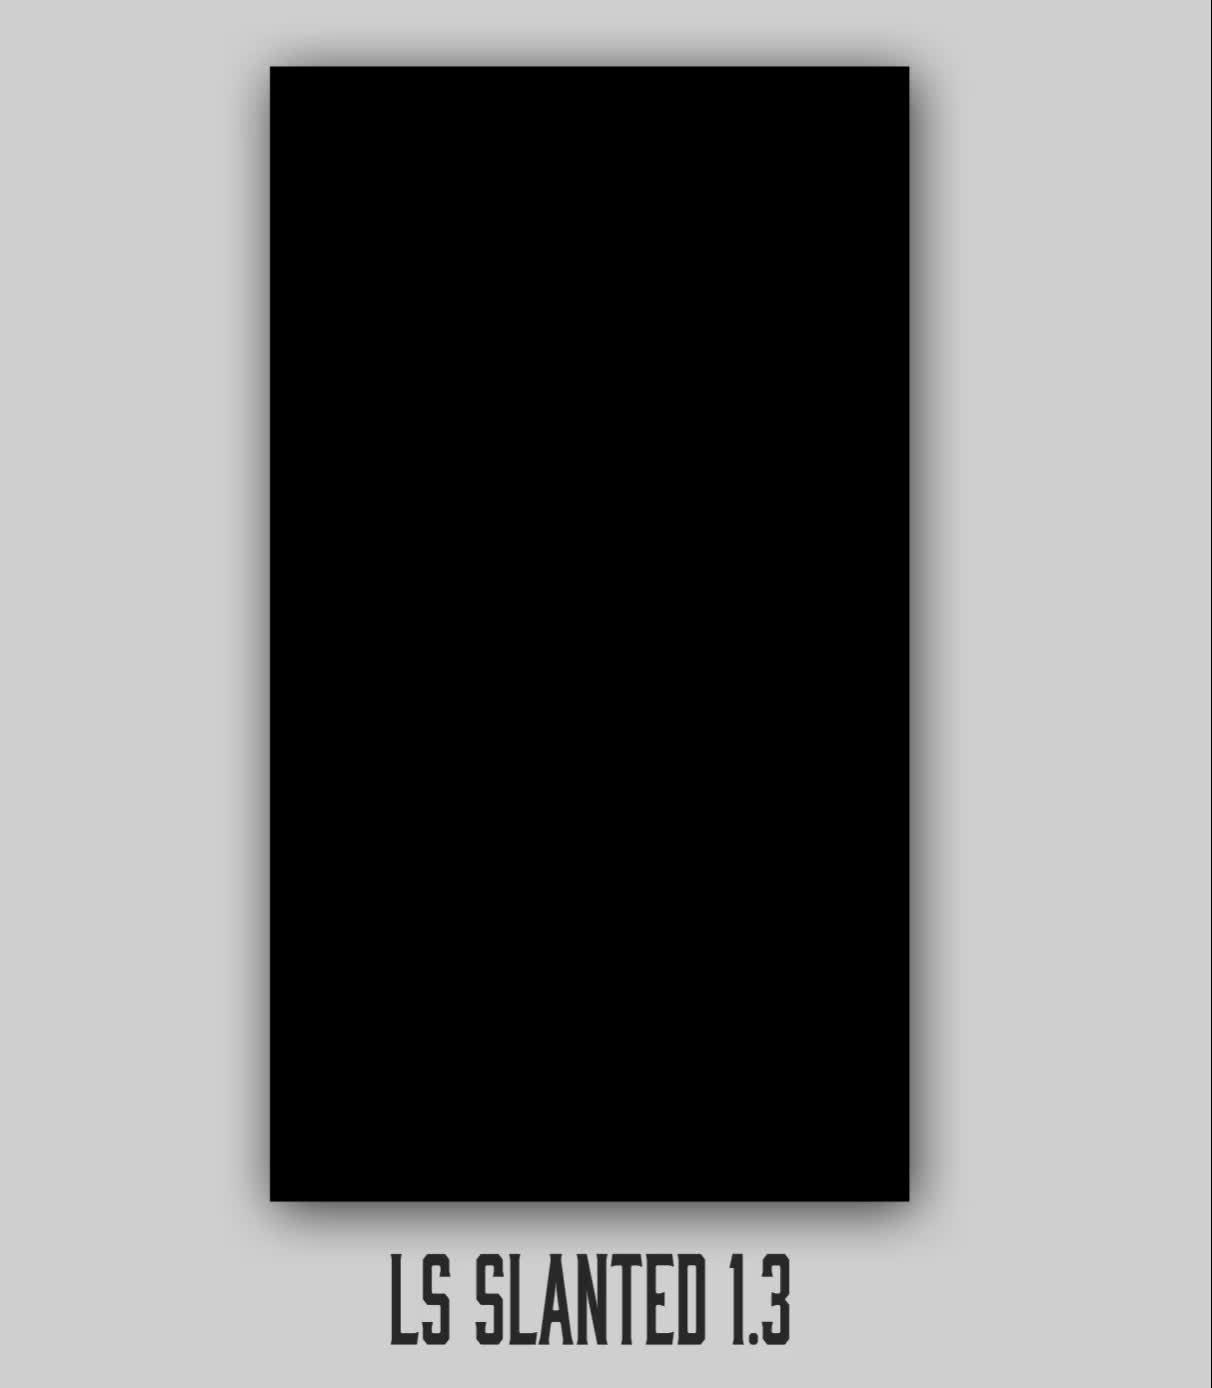 iosthemes, [Update] LS Slanted 1.3! (reddit) GIFs